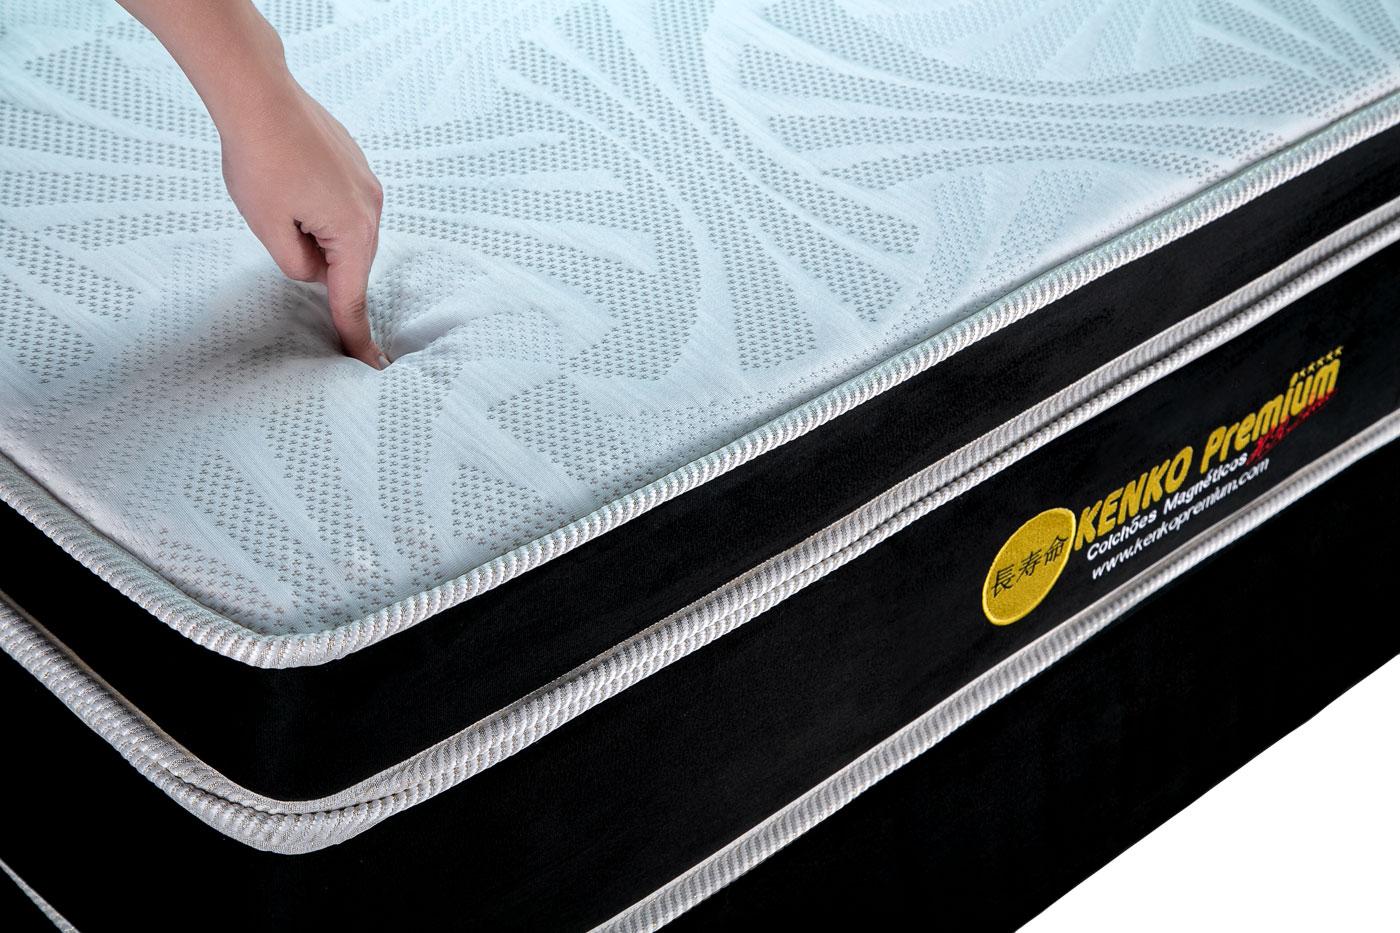 Colchão Magnético Kenko Premium, HR 29cm Látex + Massagem + Cromo - Casal 1,38x1,88  - Kenko Premium Colchões